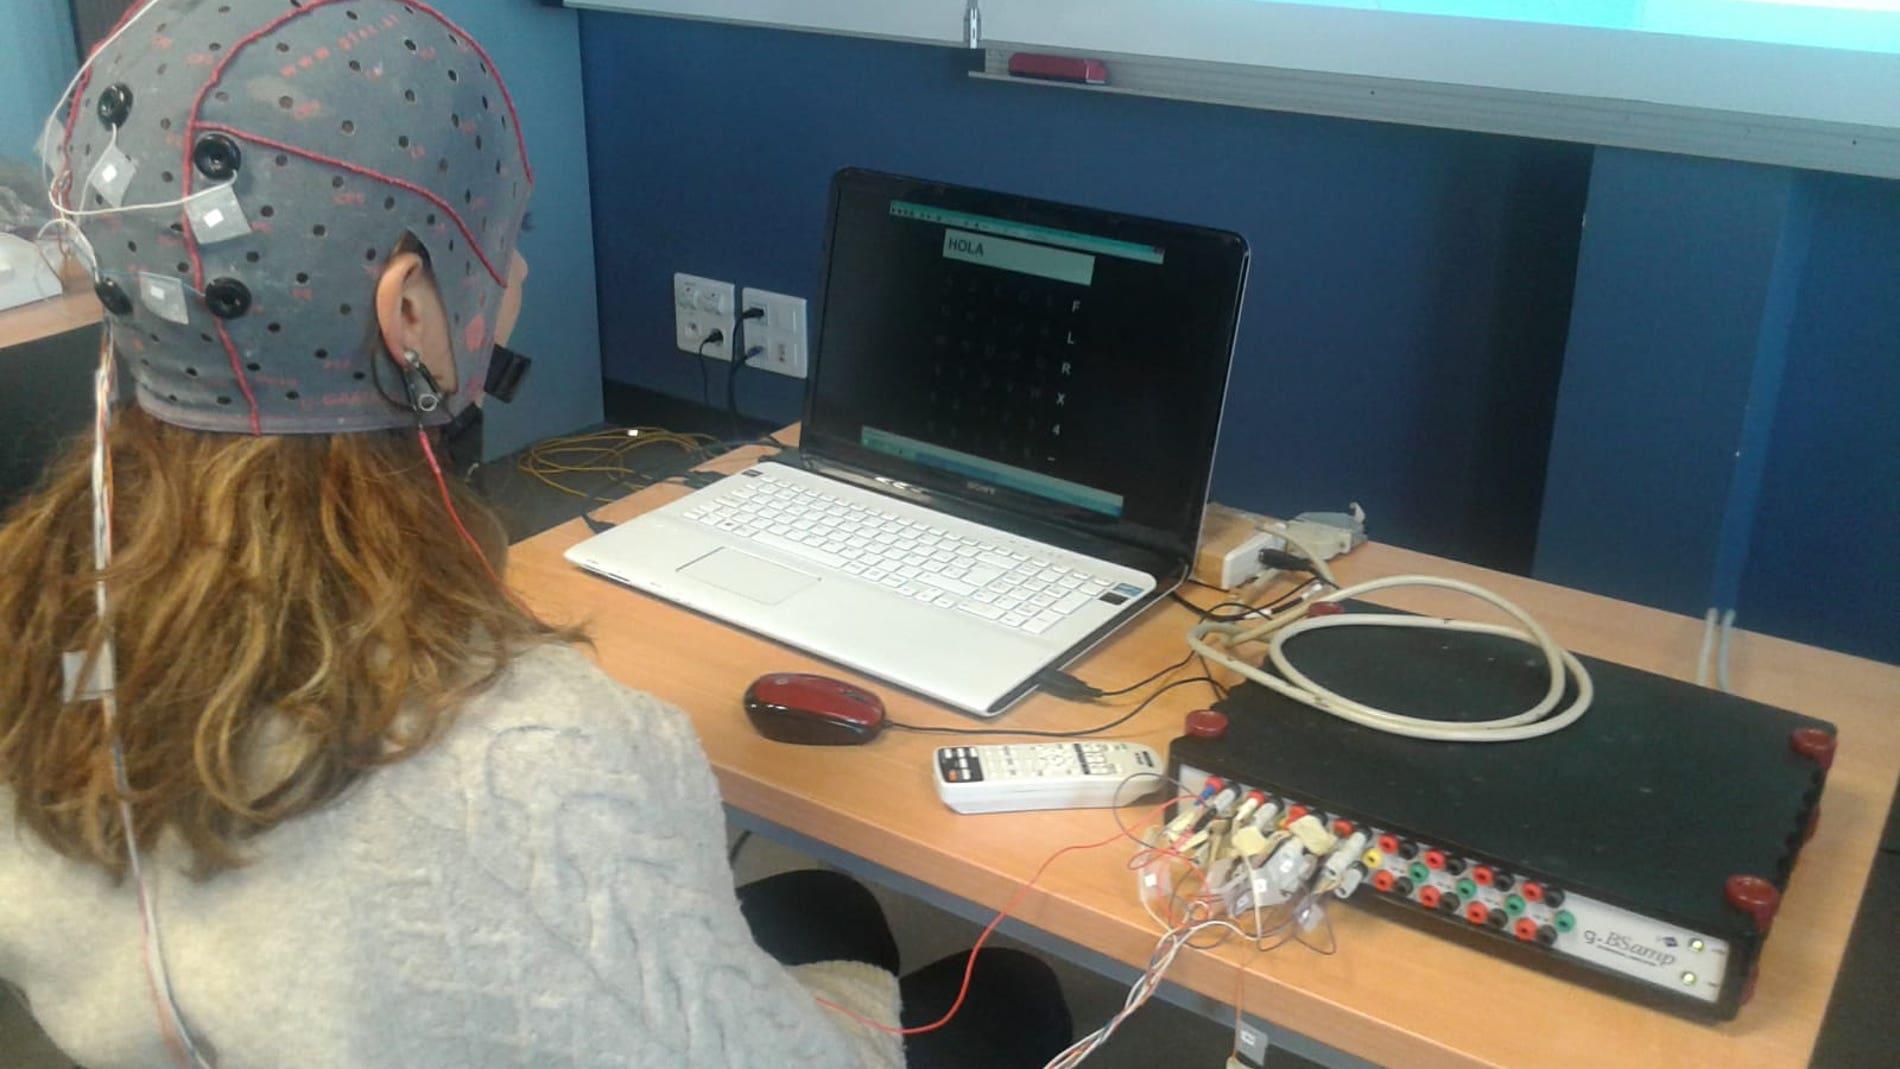 Un sistema cerebro maquina ayuda comunicarse a personas con paralisis muscular